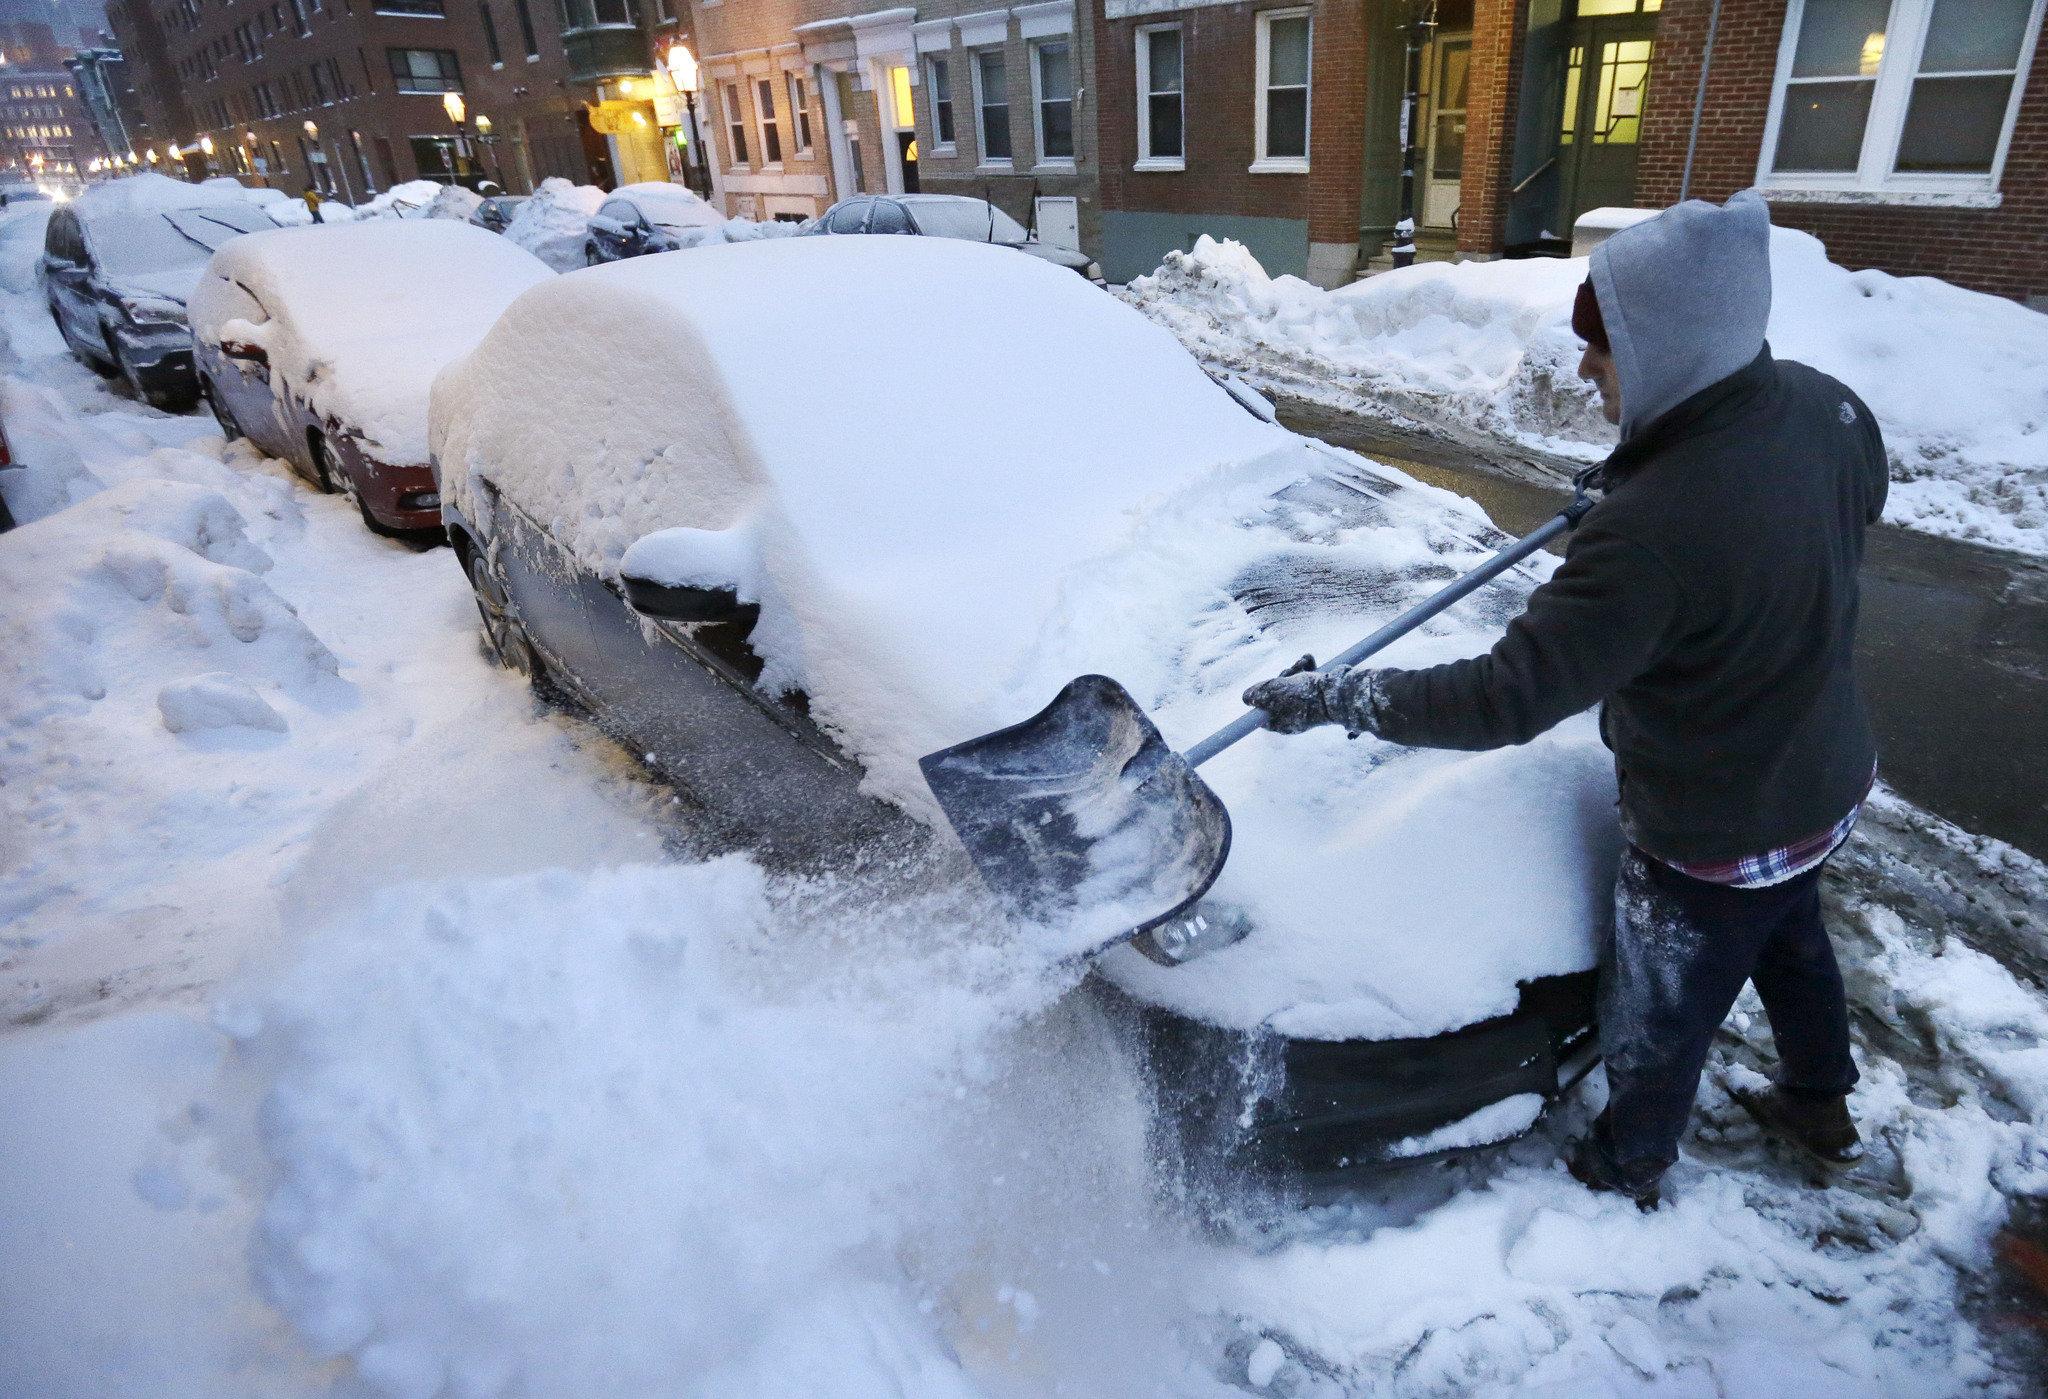 Winter storm marcus boston mayor whines city isn t used to all the snow unlike buffalo alaska syracuse com